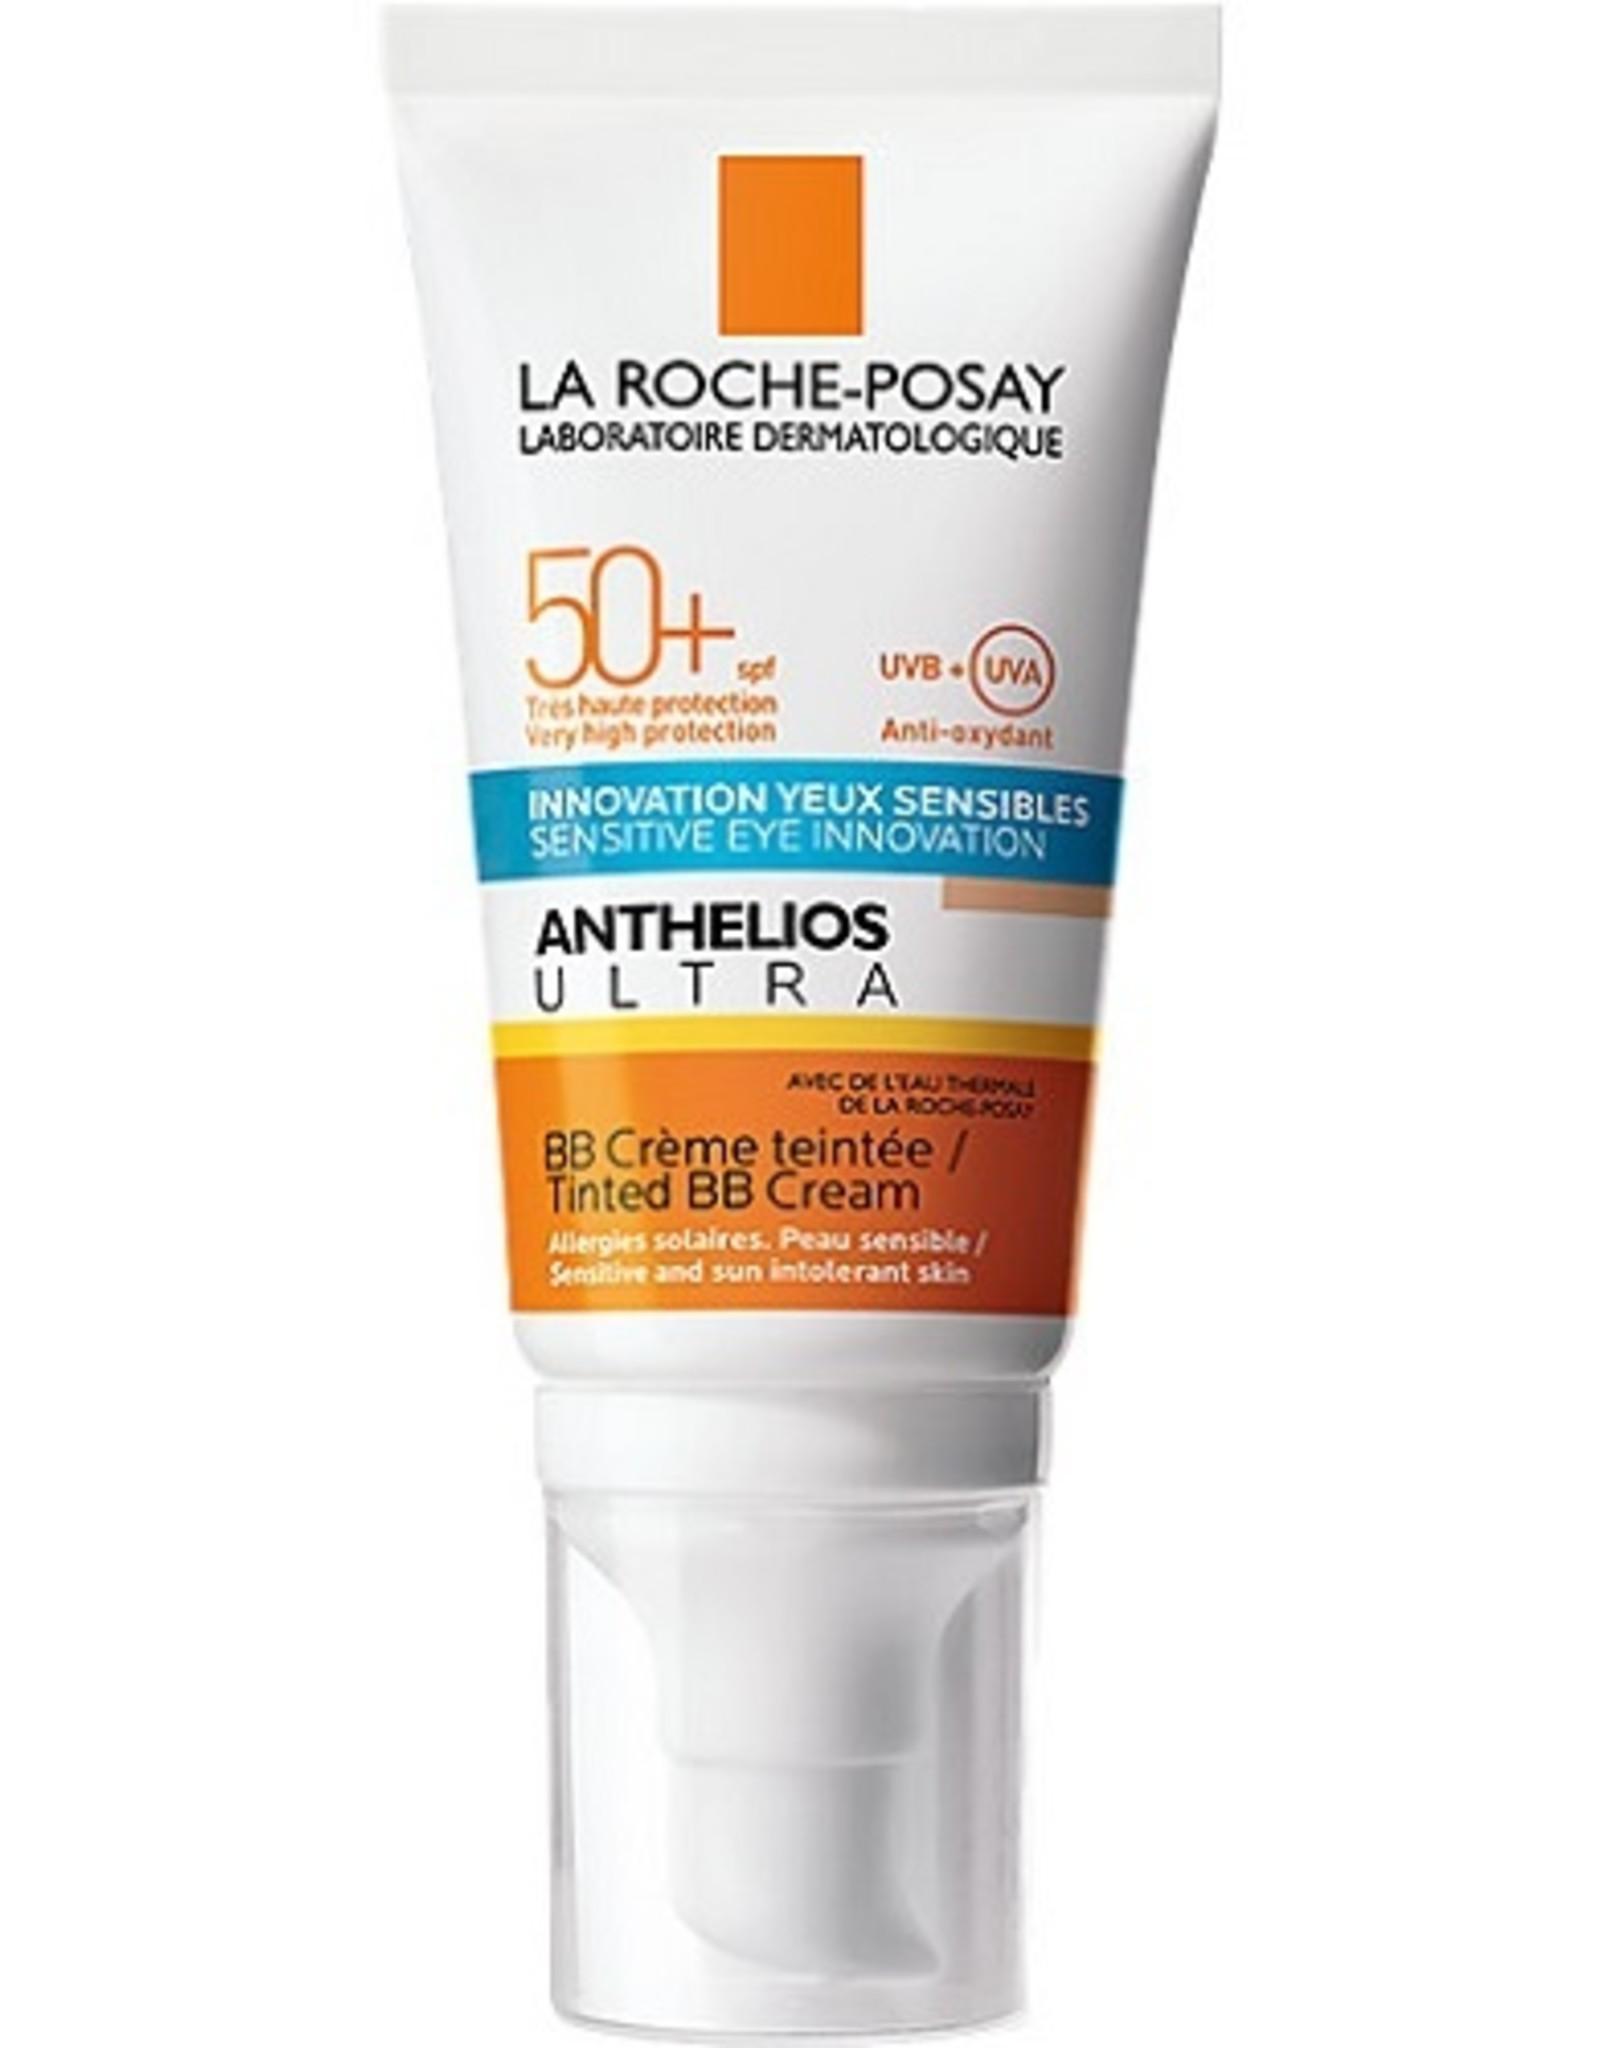 La Roche Posay Anthelios Ultra Getinte creme Gevoelige ogen SPF50+  50ml